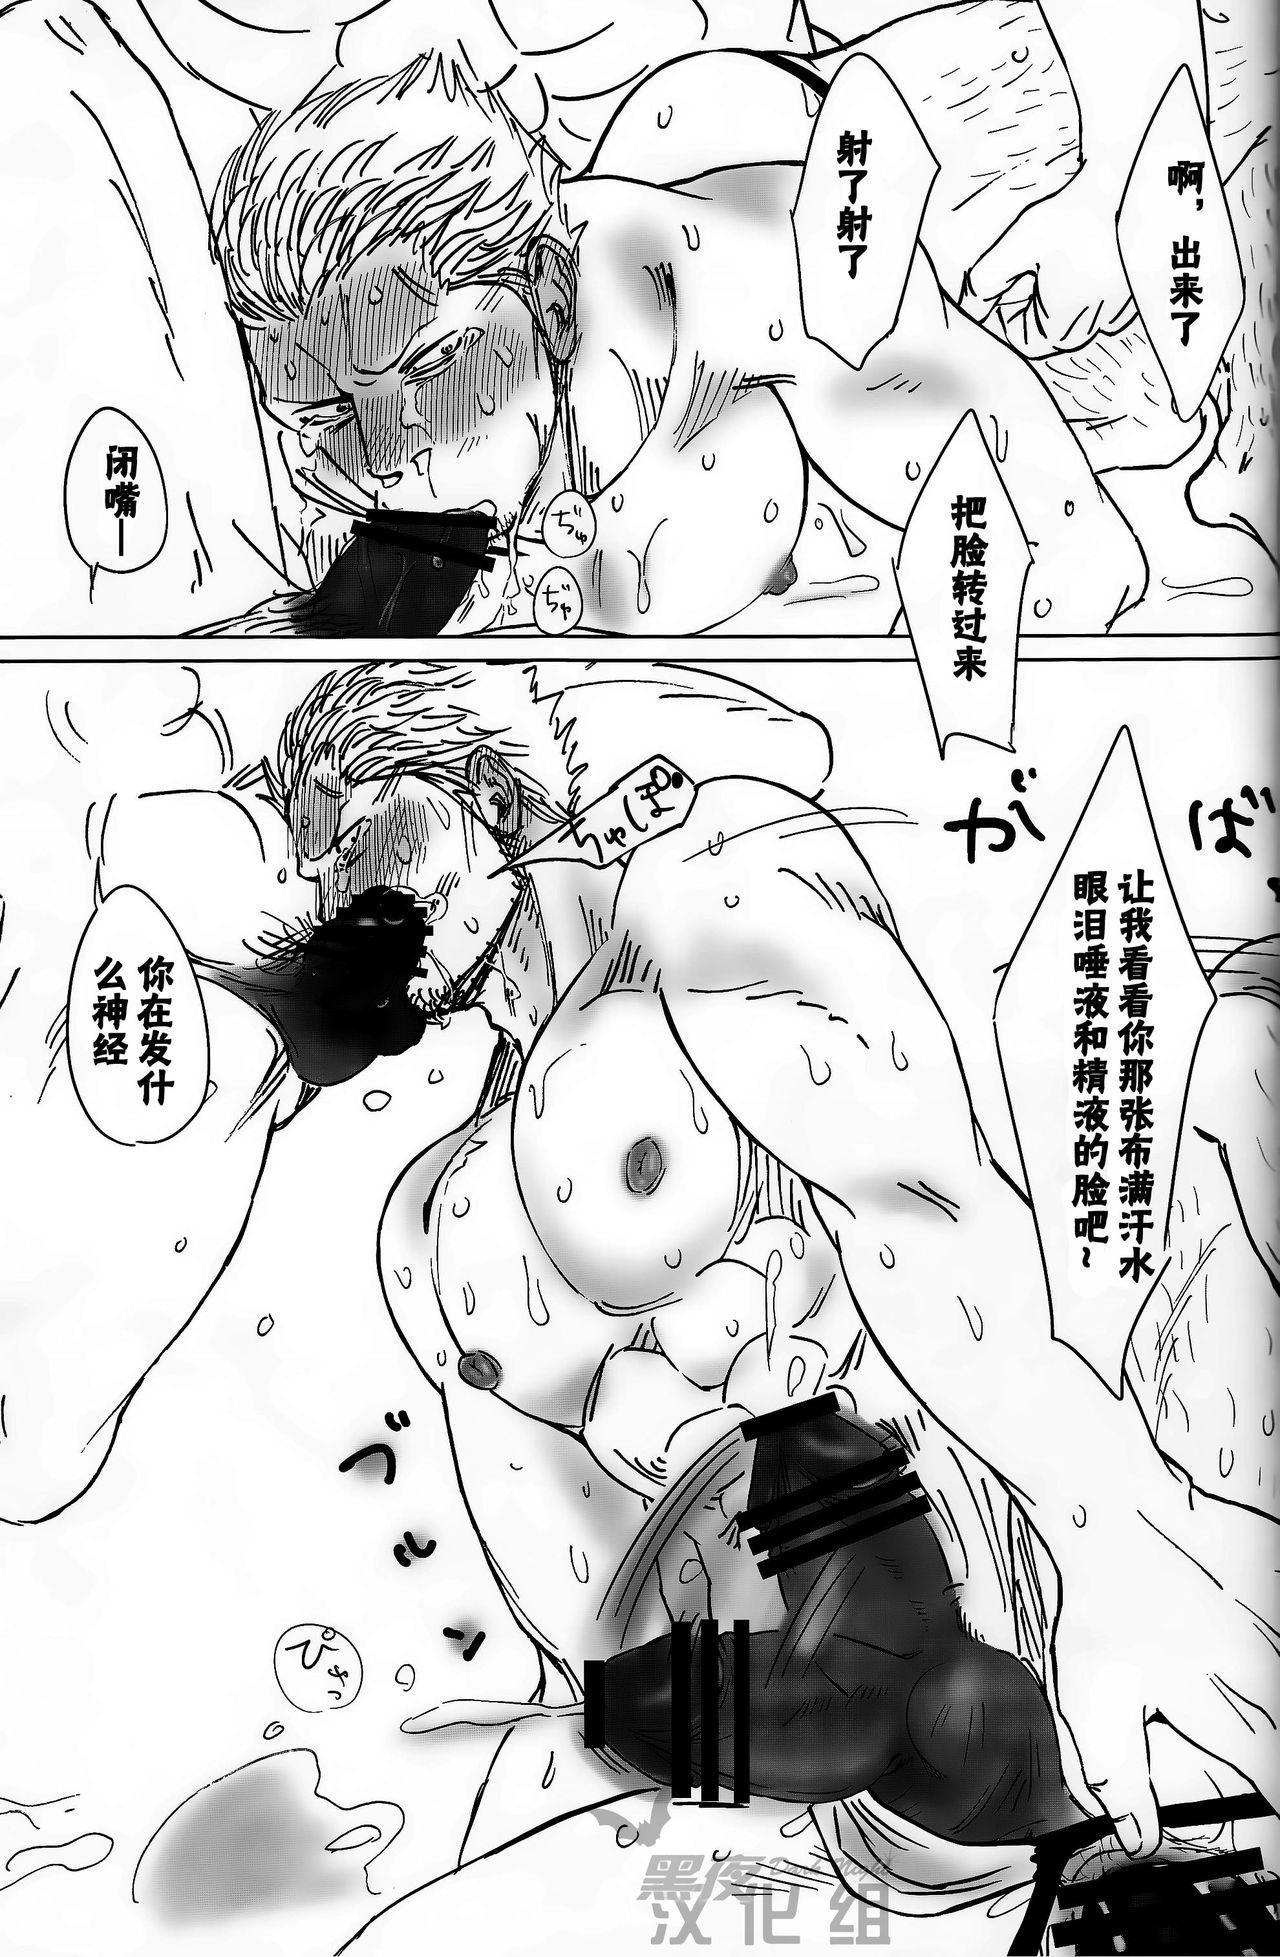 (C82) [Chikuwamome (Ishikawa)] Kemuri Rinkan ~Sin G-5~ | 煙輪x~真G5~ (One Piece) [Chinese] [黑夜汉化组] 19